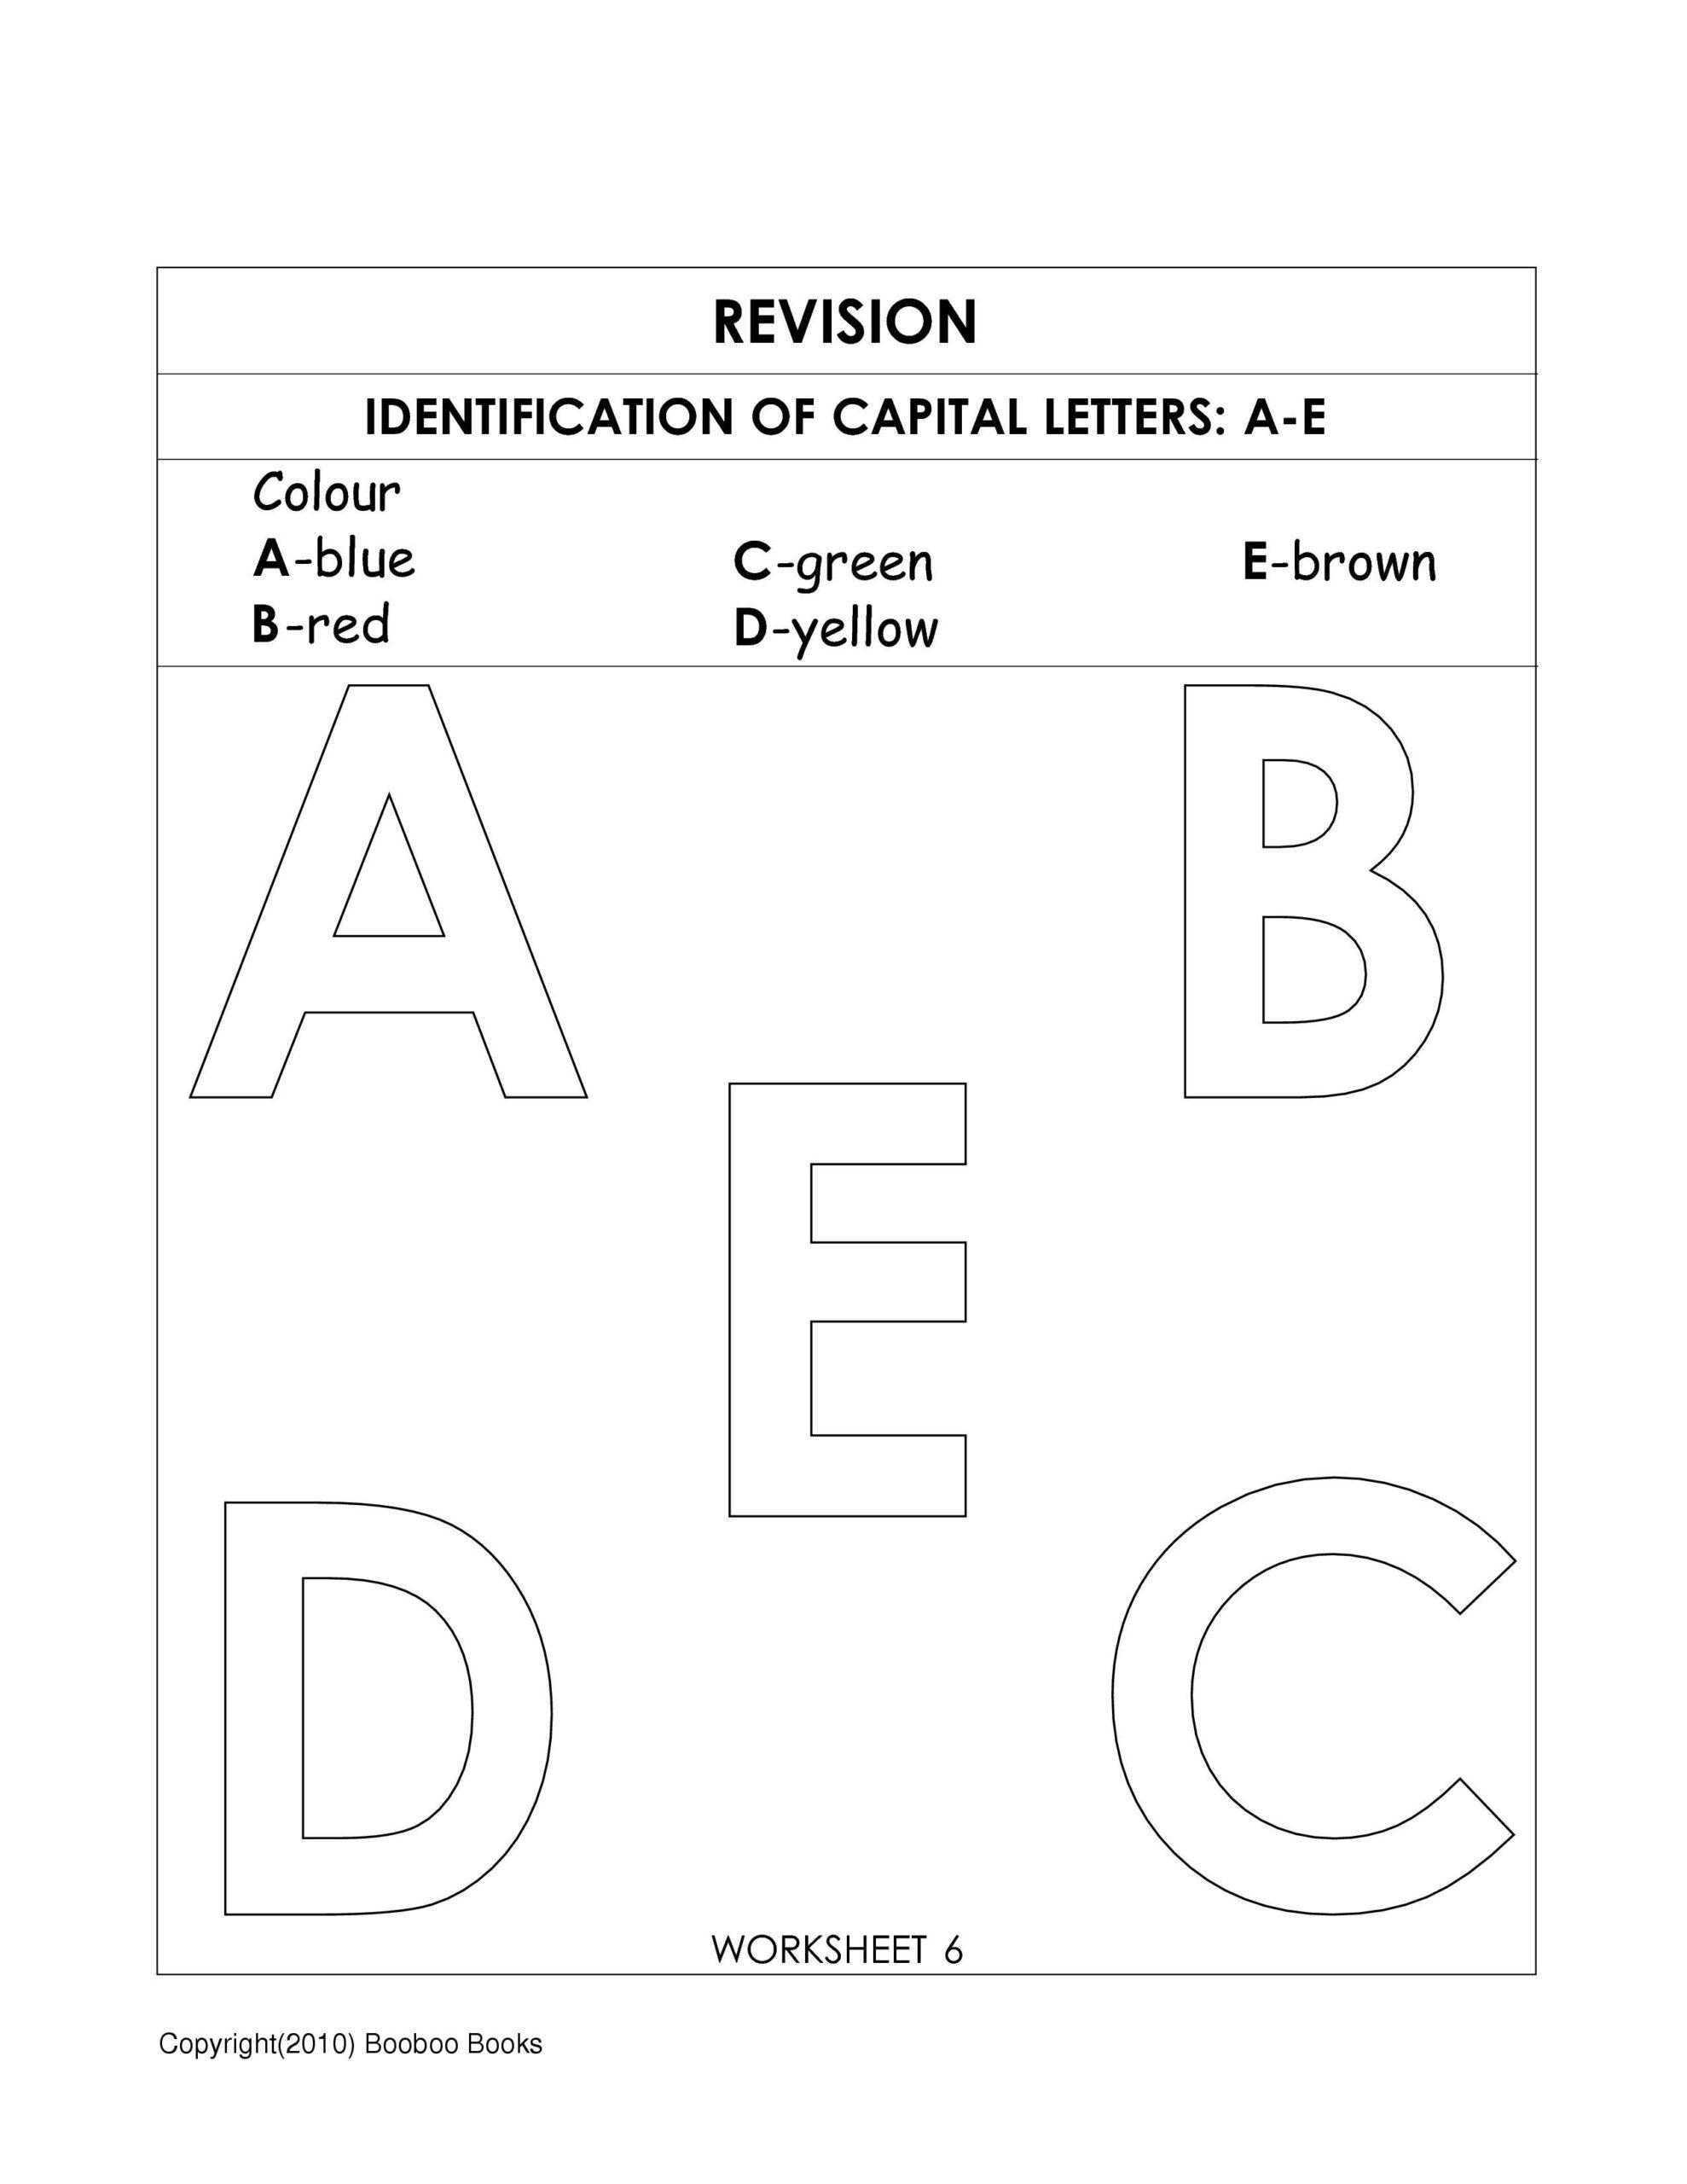 Kindergarten Alphabet Worksheets | Alphabet Worksheets in Alphabet Revision Worksheets/kindergarten